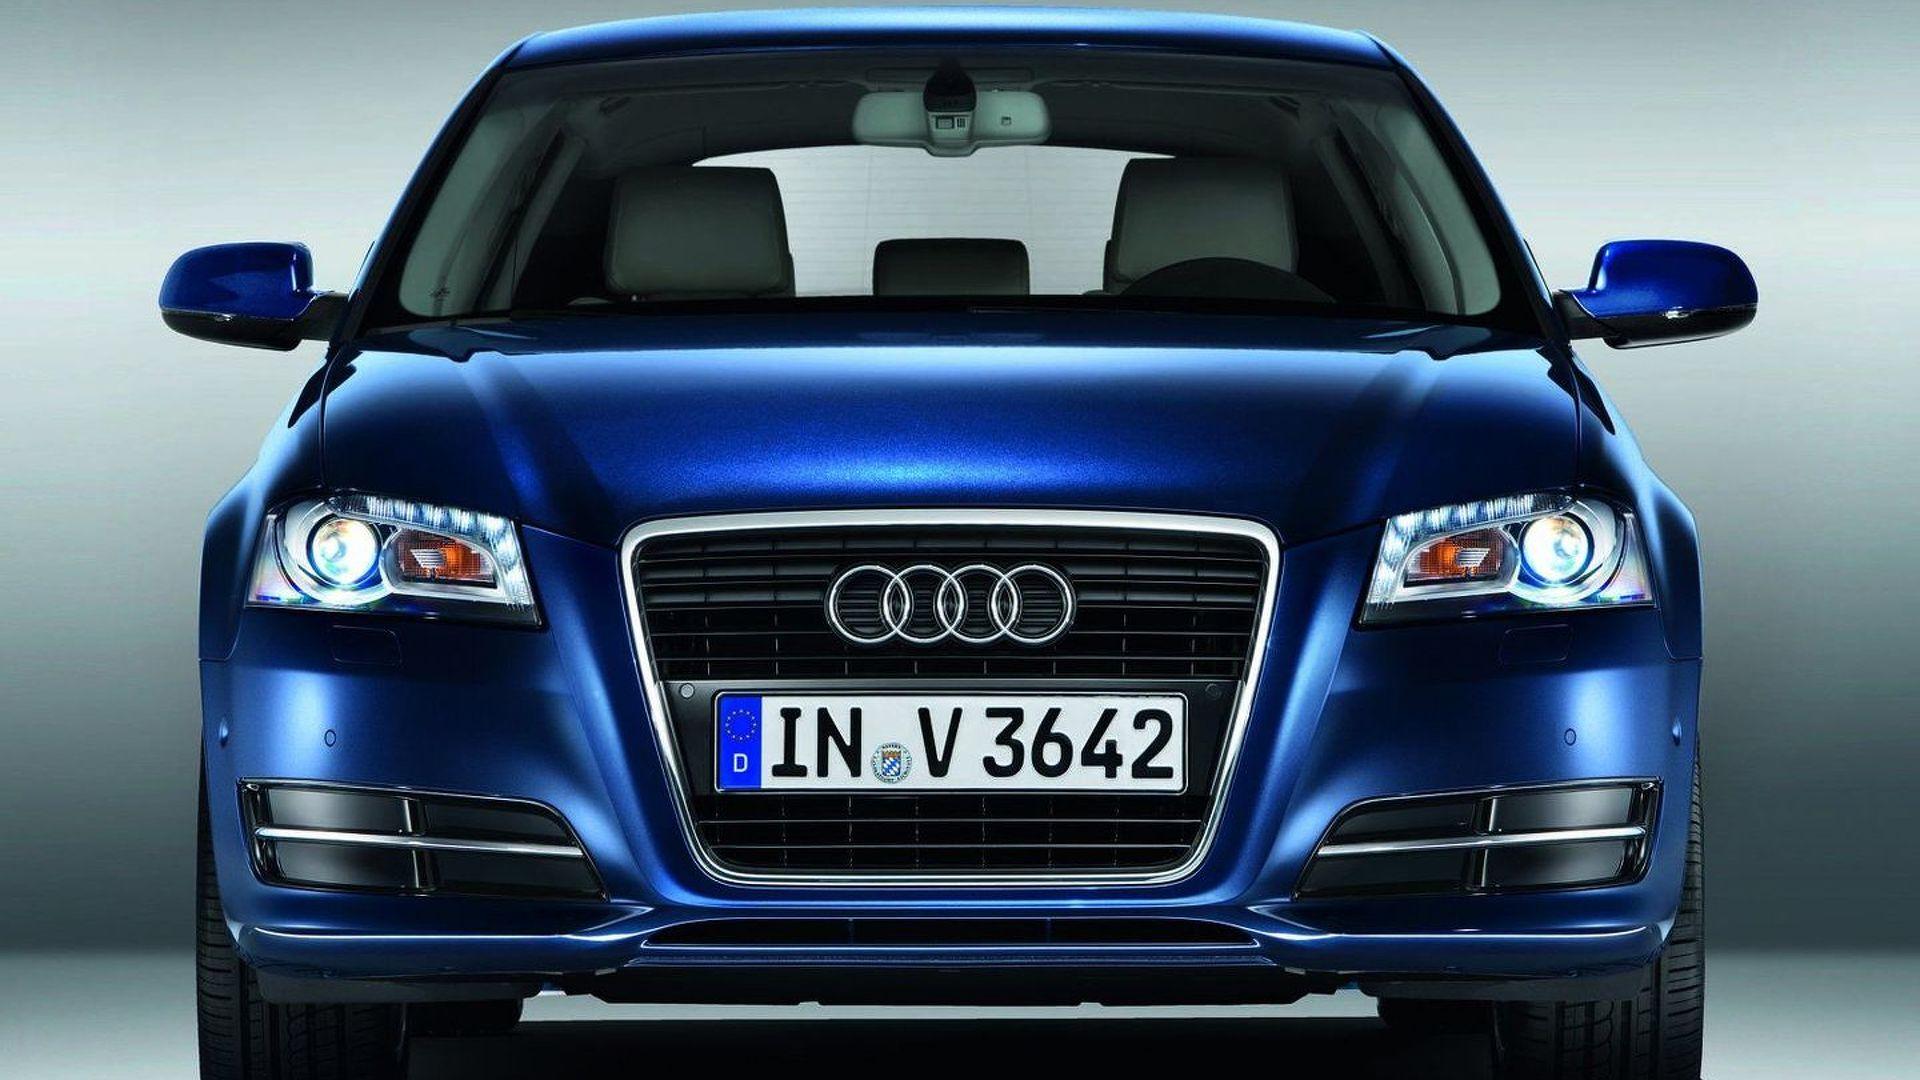 Kelebihan Kekurangan Audi A3 Sportback 2011 Murah Berkualitas